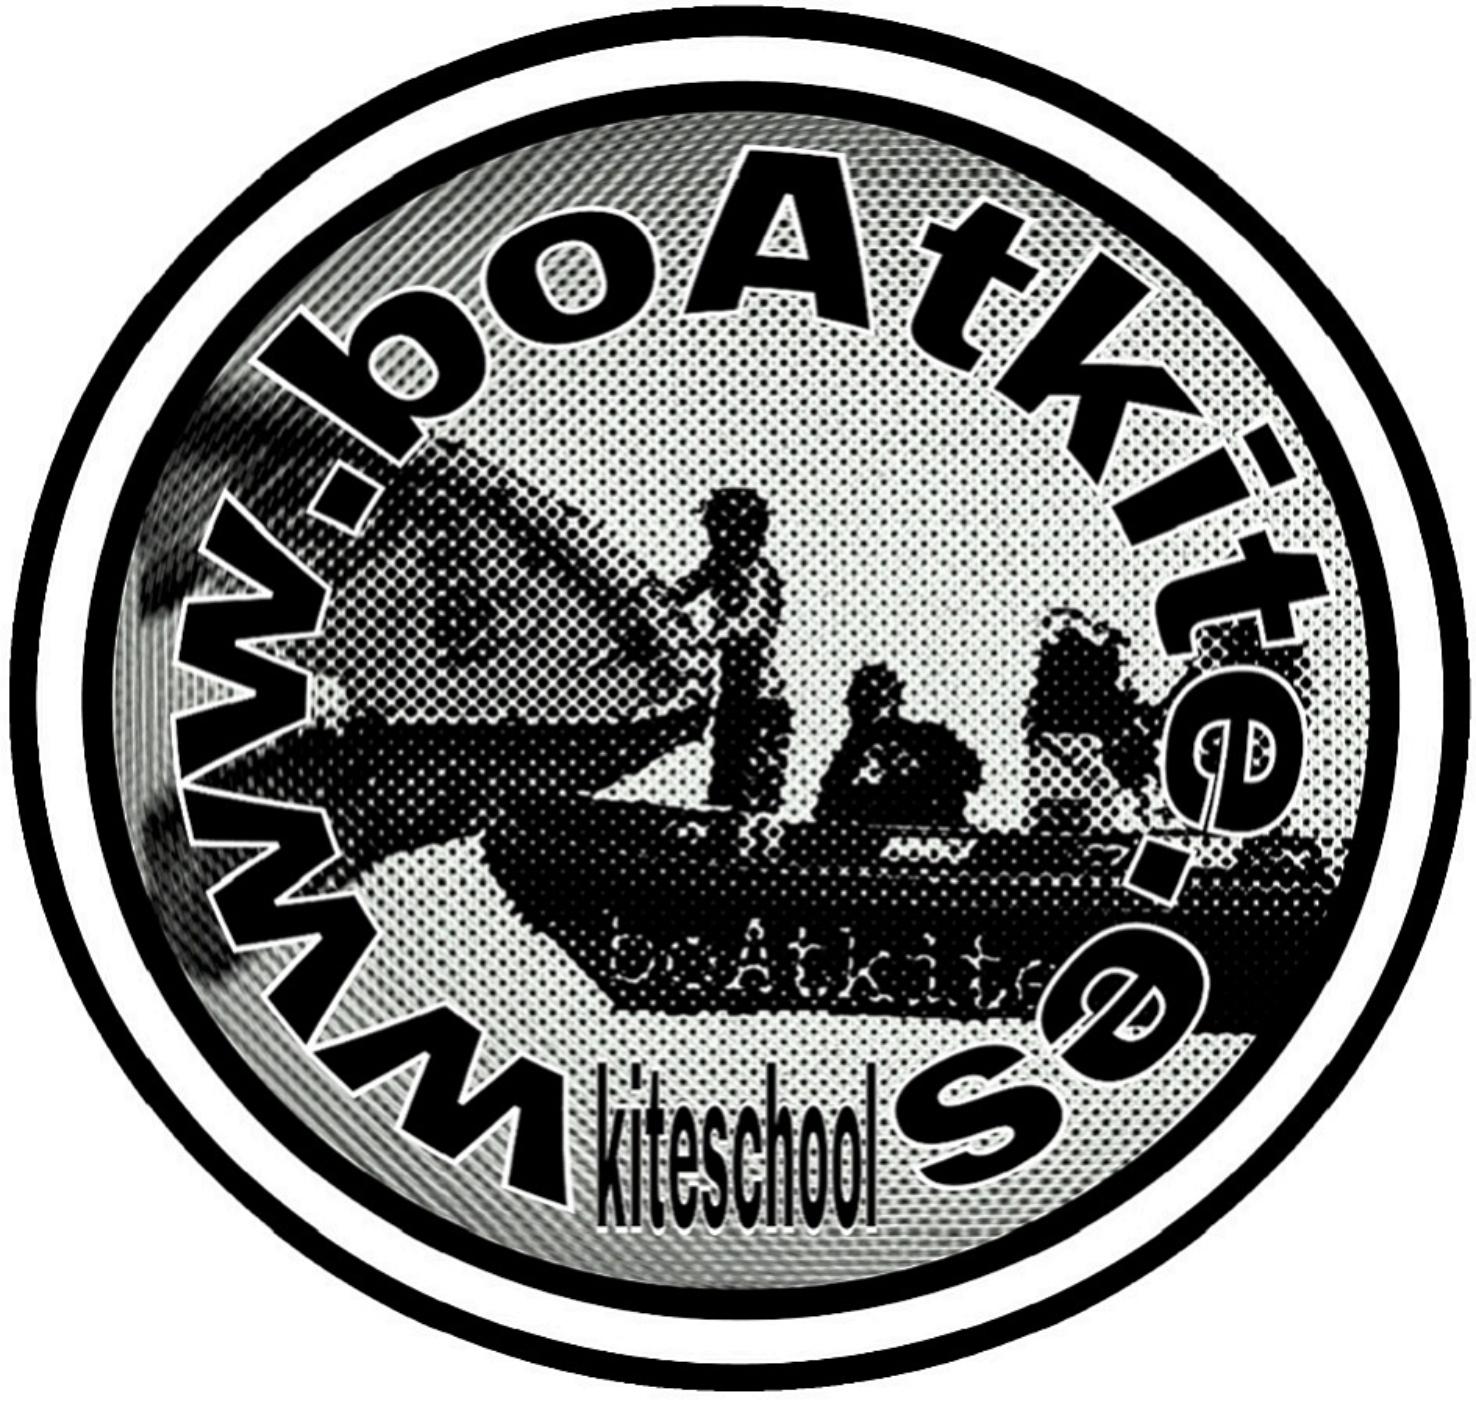 escuela kite boatkite